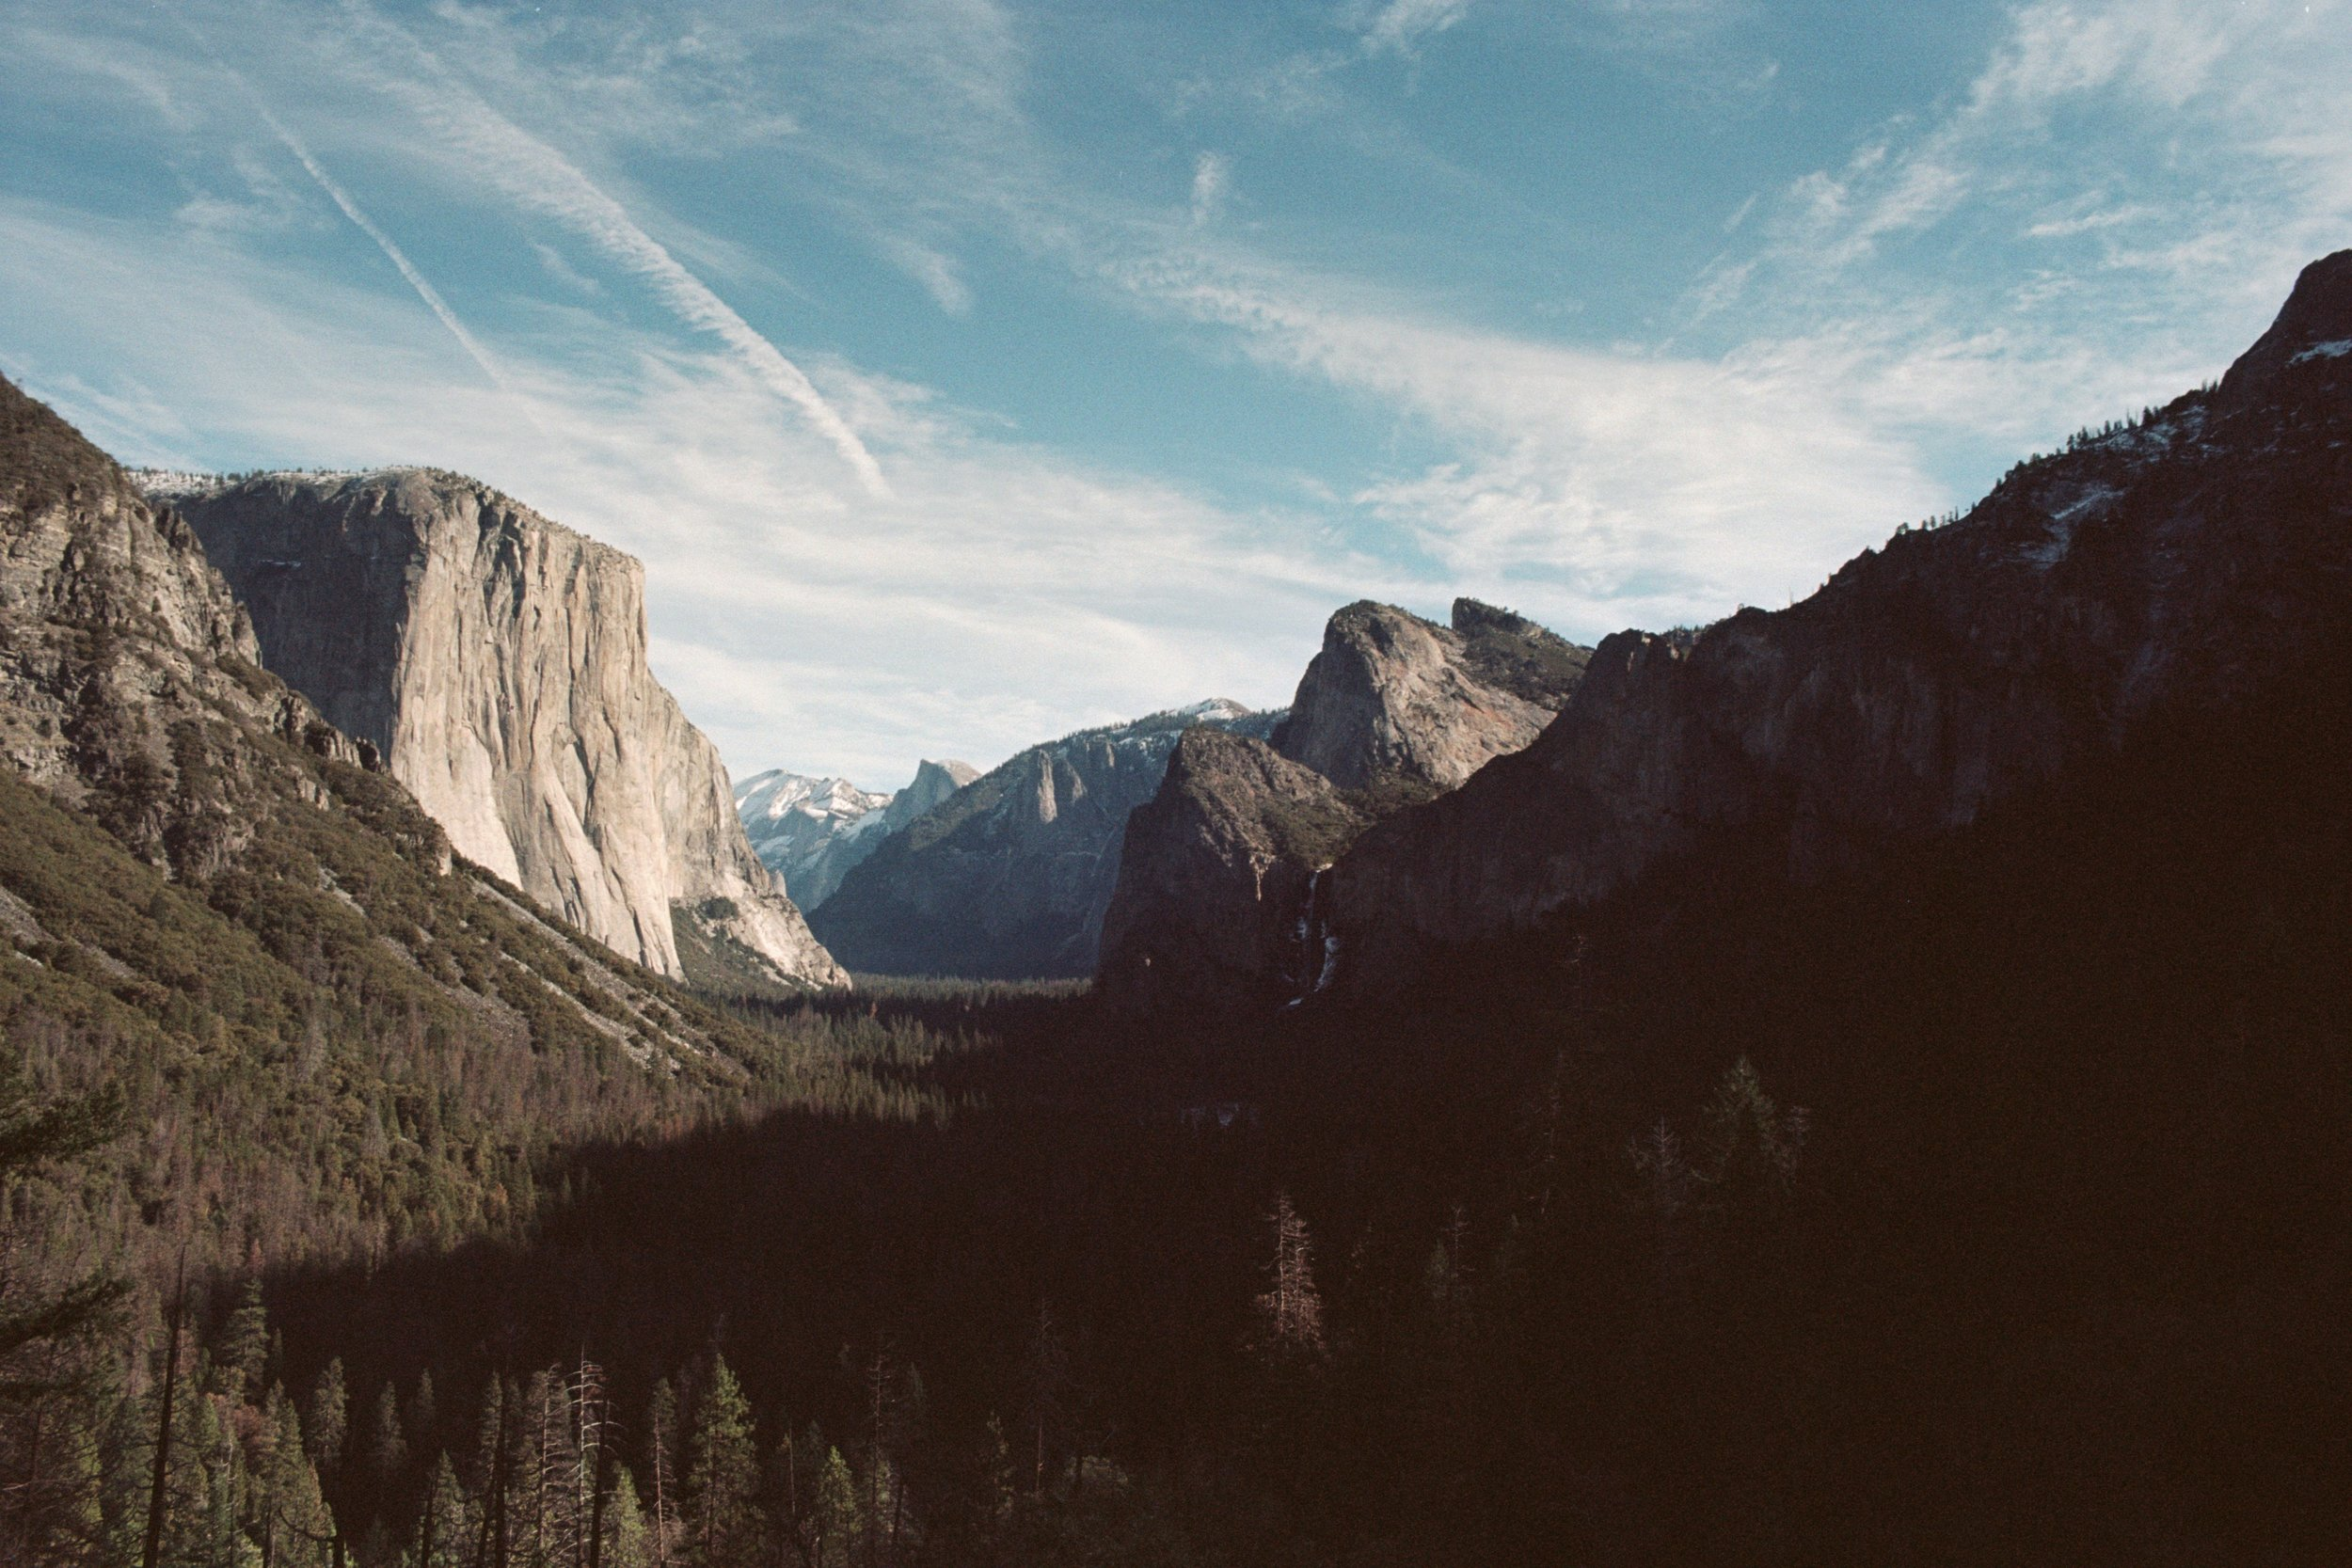 Iciar J. Carrasco_California_Yosemite_10.jpg